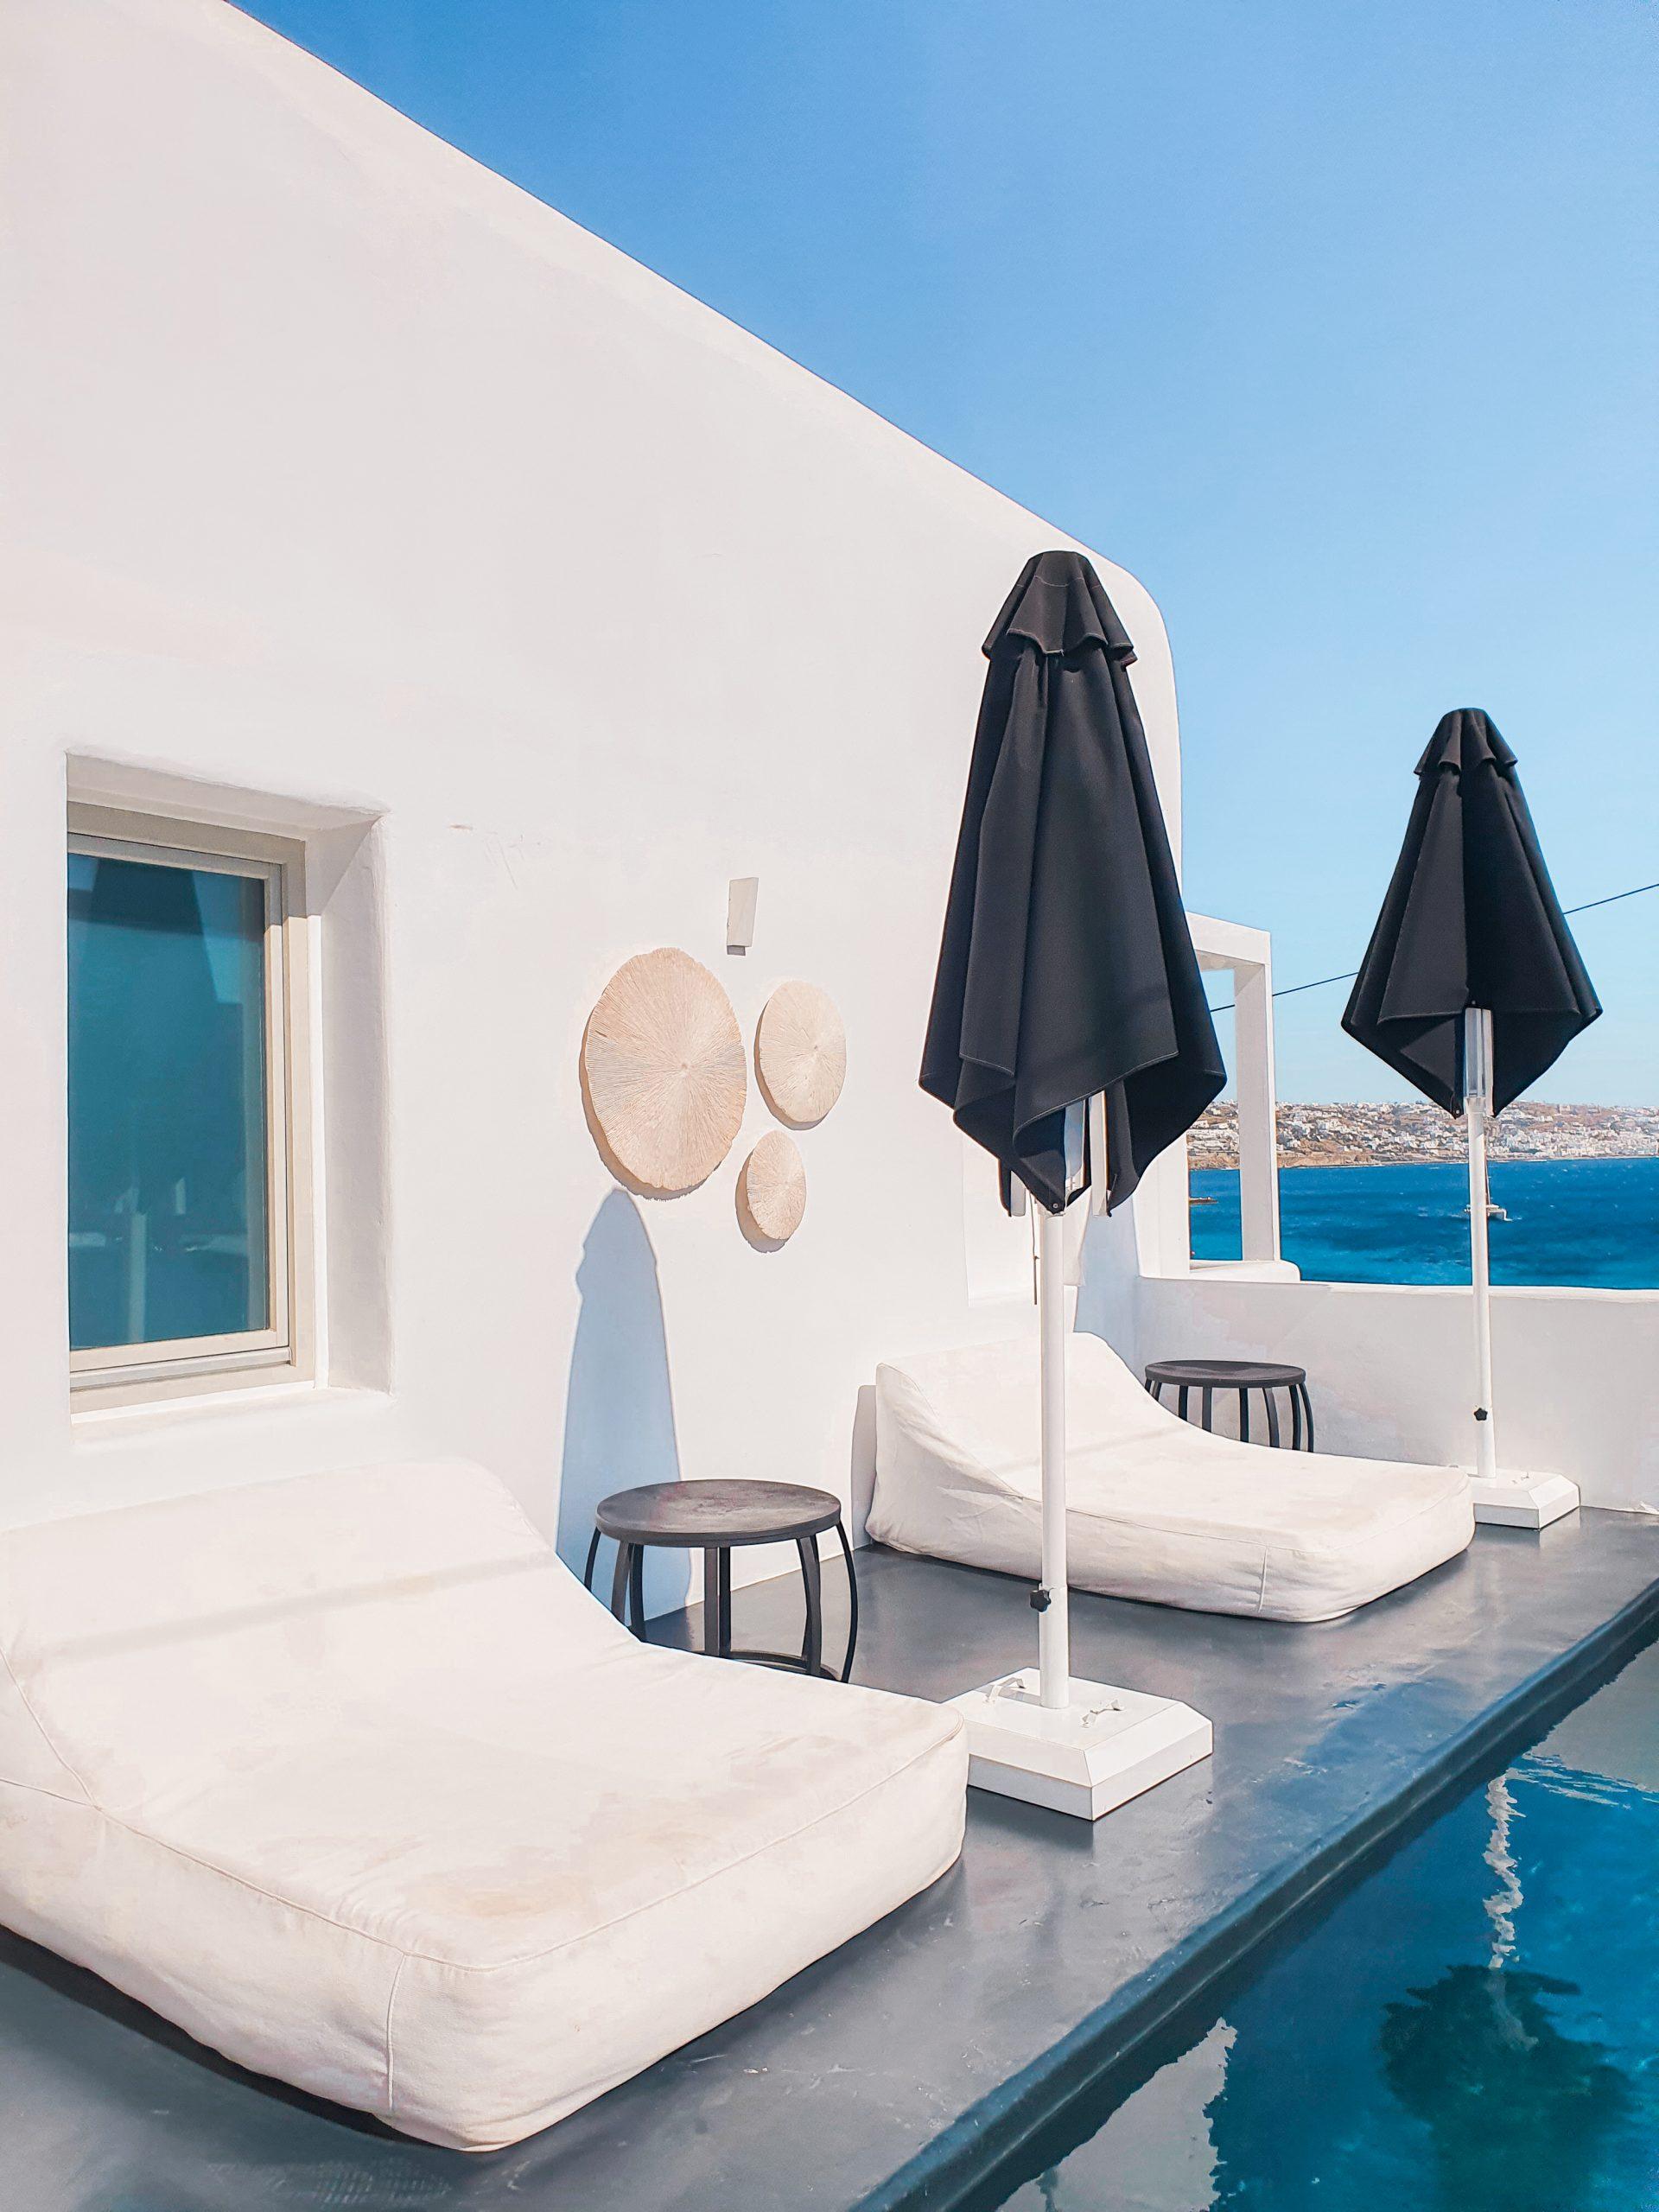 Pool design at Nimbus Mykonos